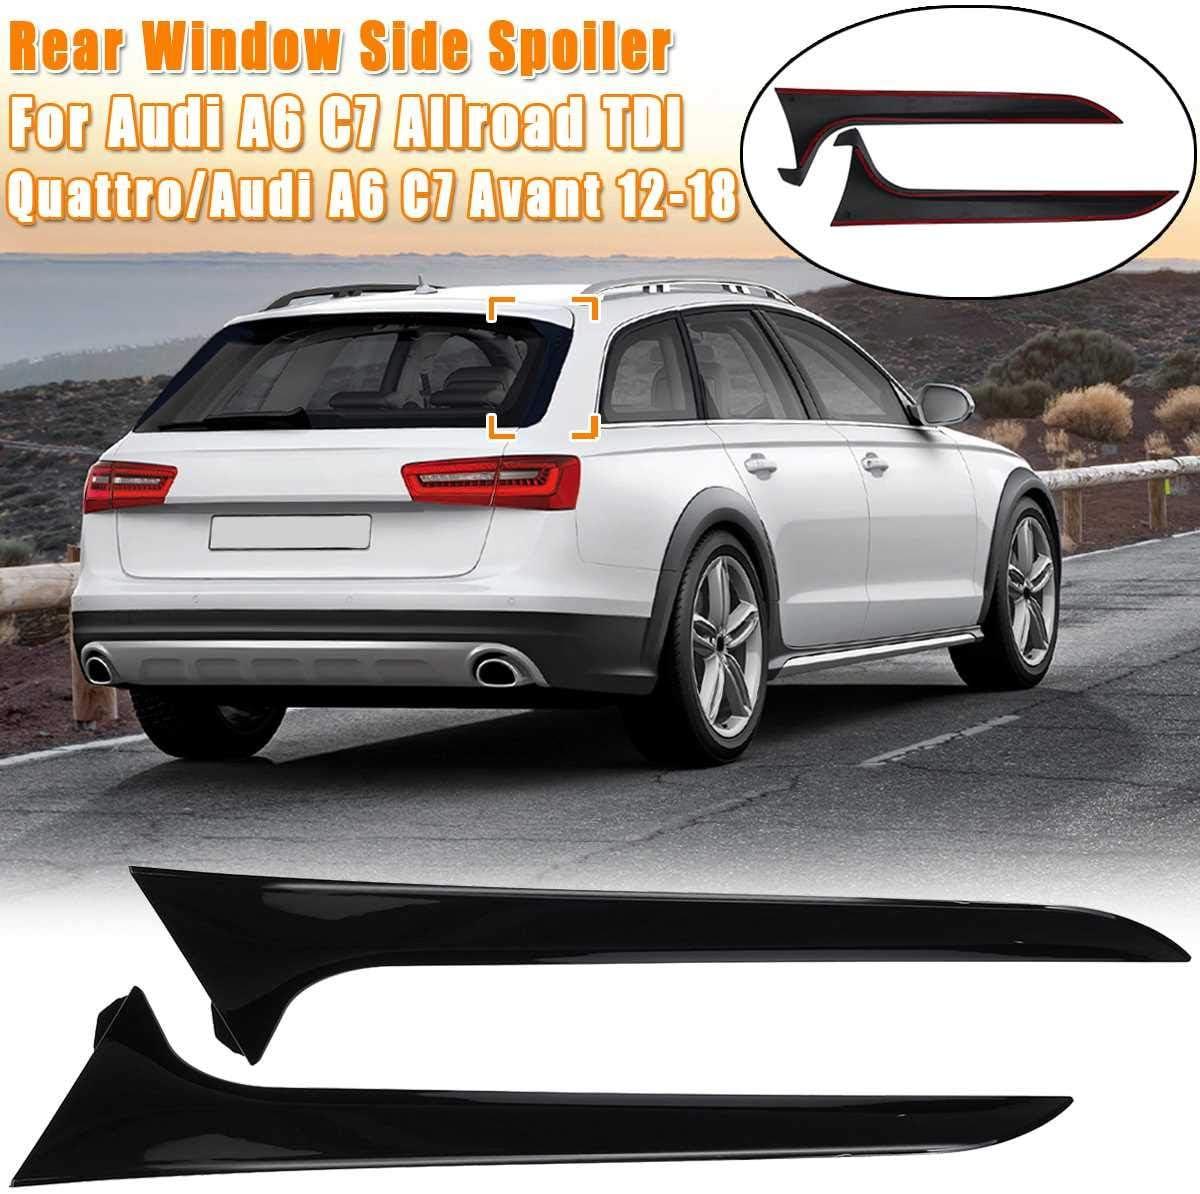 Rear Behind Window Spoiler Side Strip F/ür A6 C7 Heckspoiler Abdeckung Trim Exterior Refit Kit Glossy Black